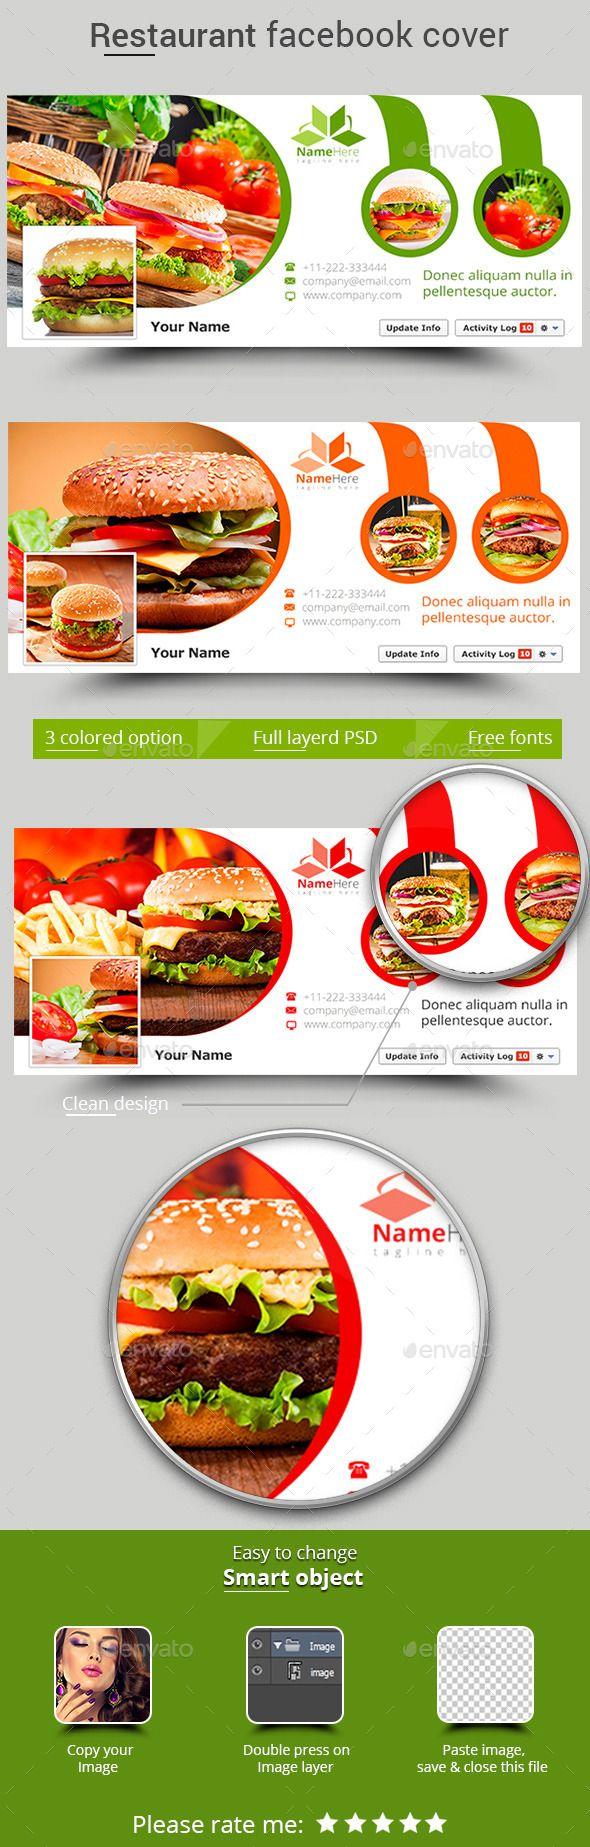 Restaurant Facebook Cover Template #design #psd Download: http://graphicriver.net/item/restaurant-facebook-cover/12794644?ref=ksioks